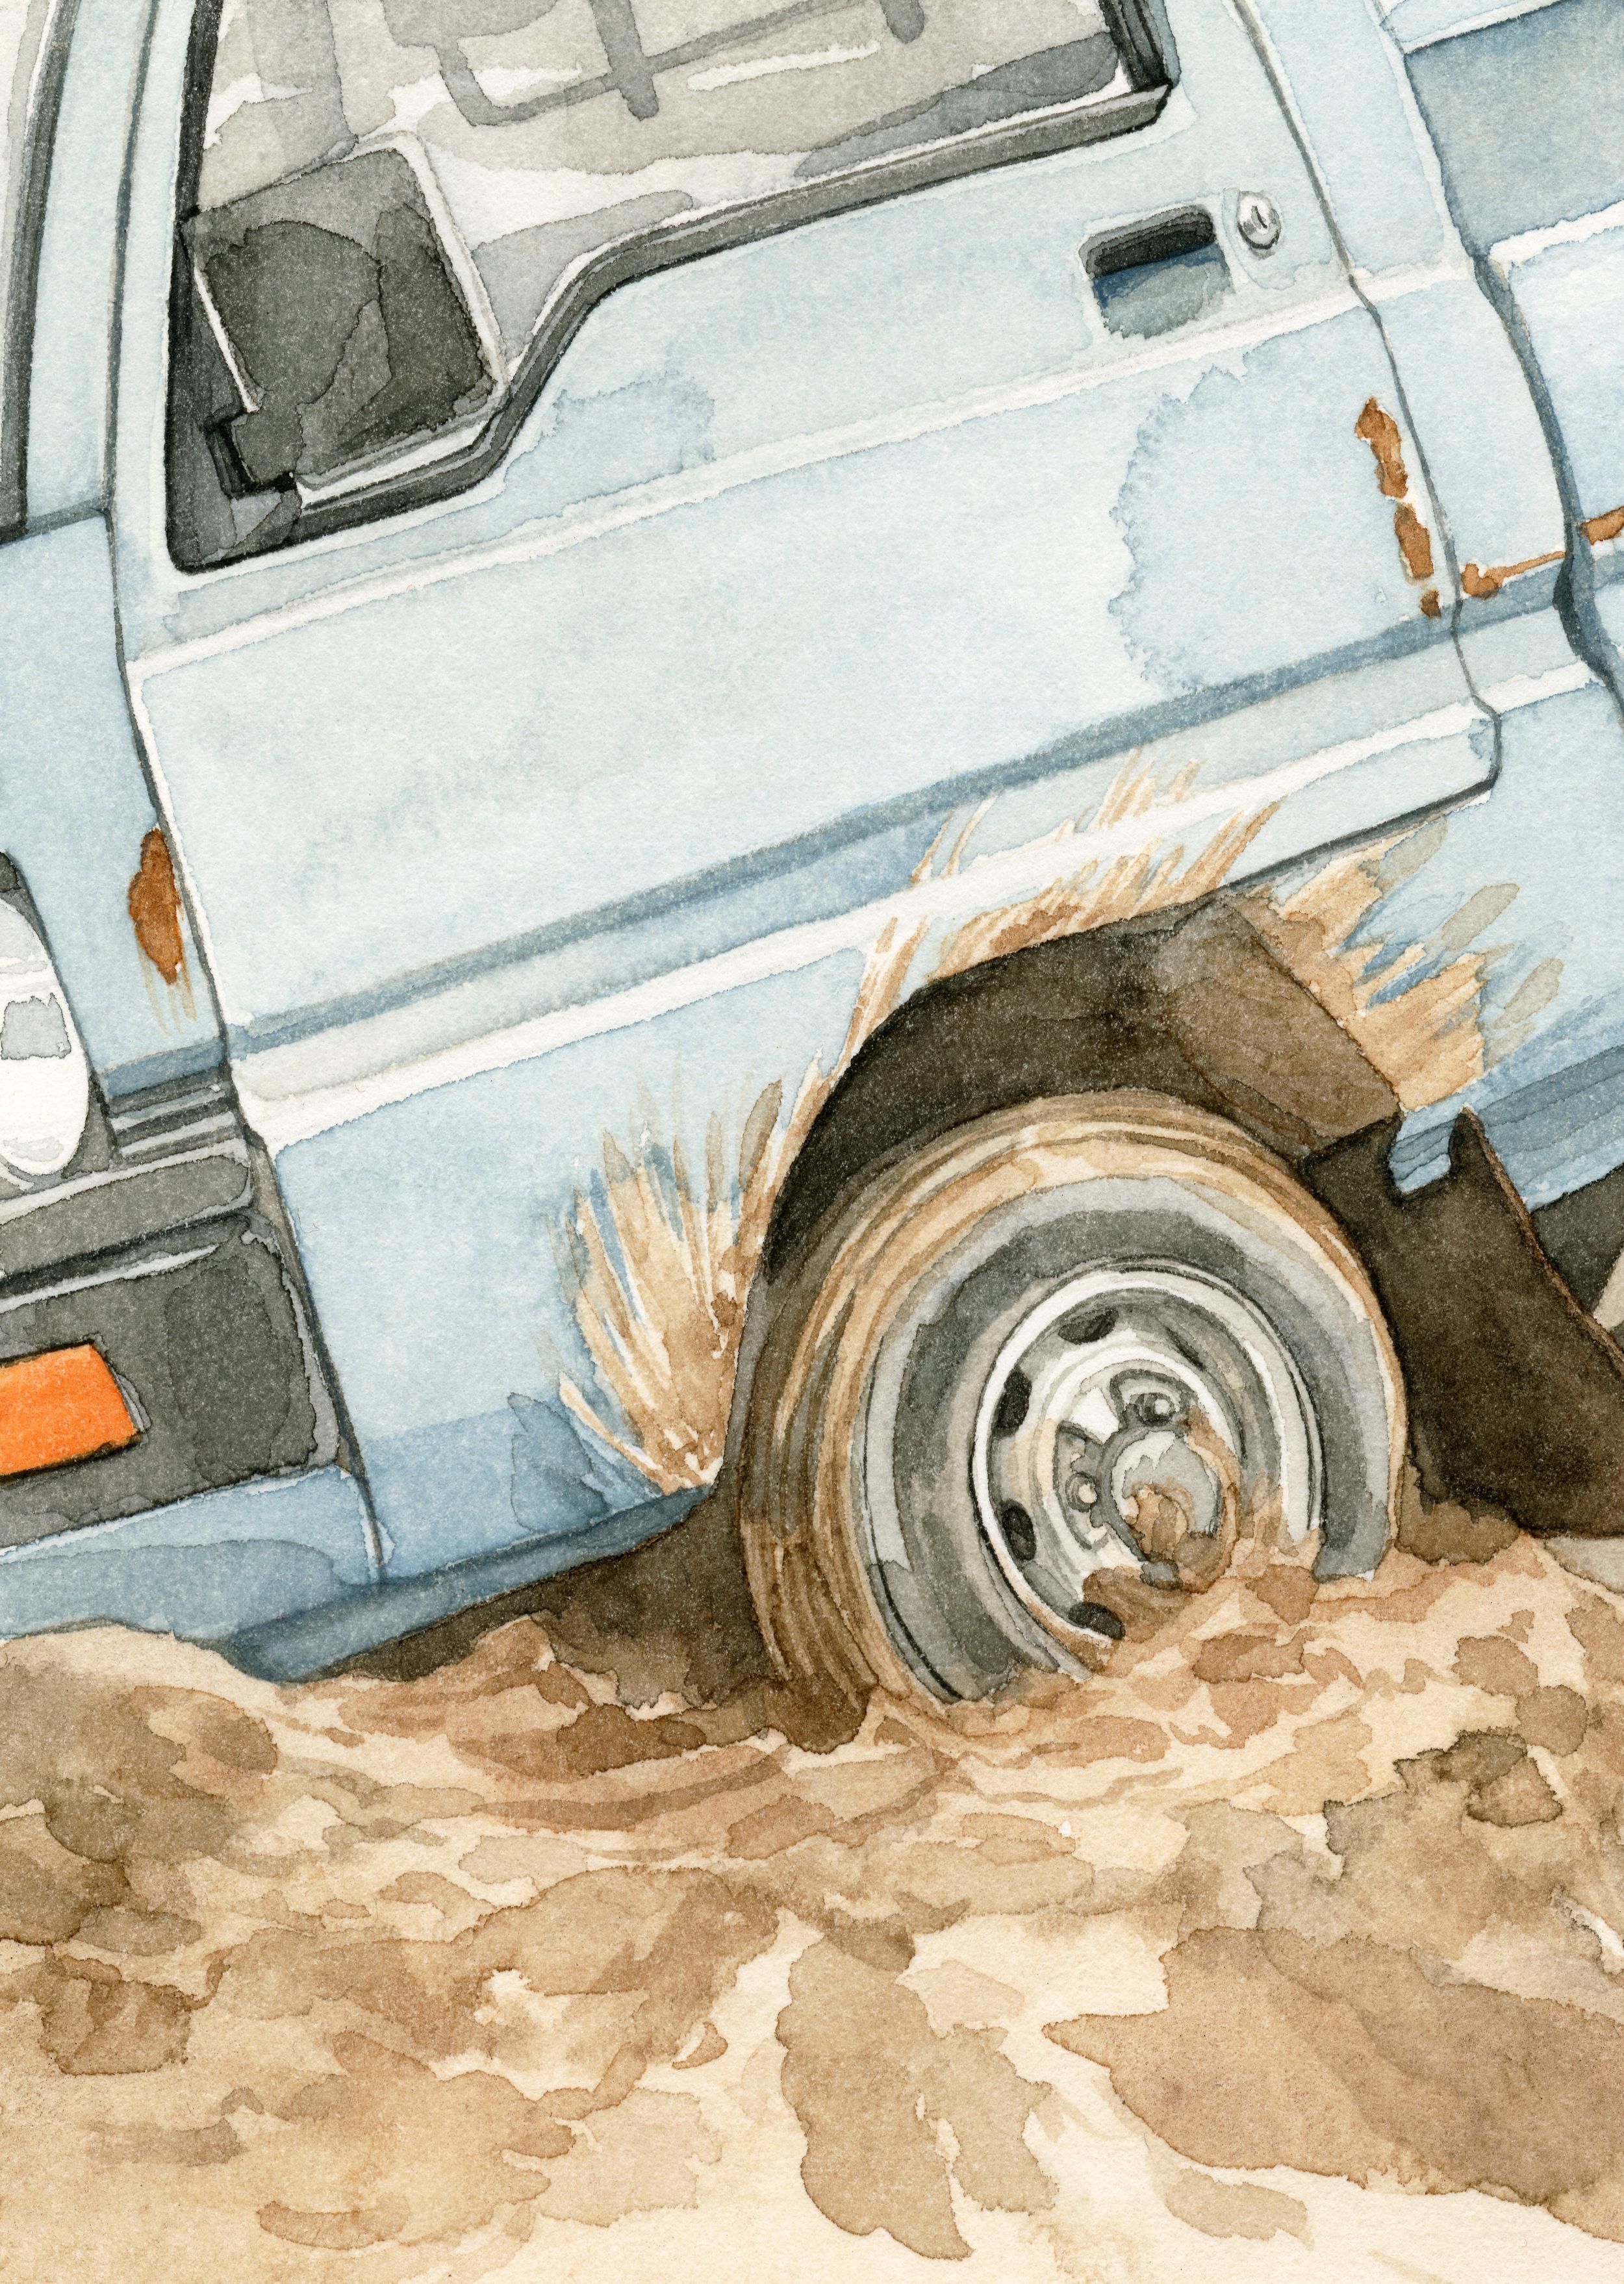 truck-tire-web.jpg